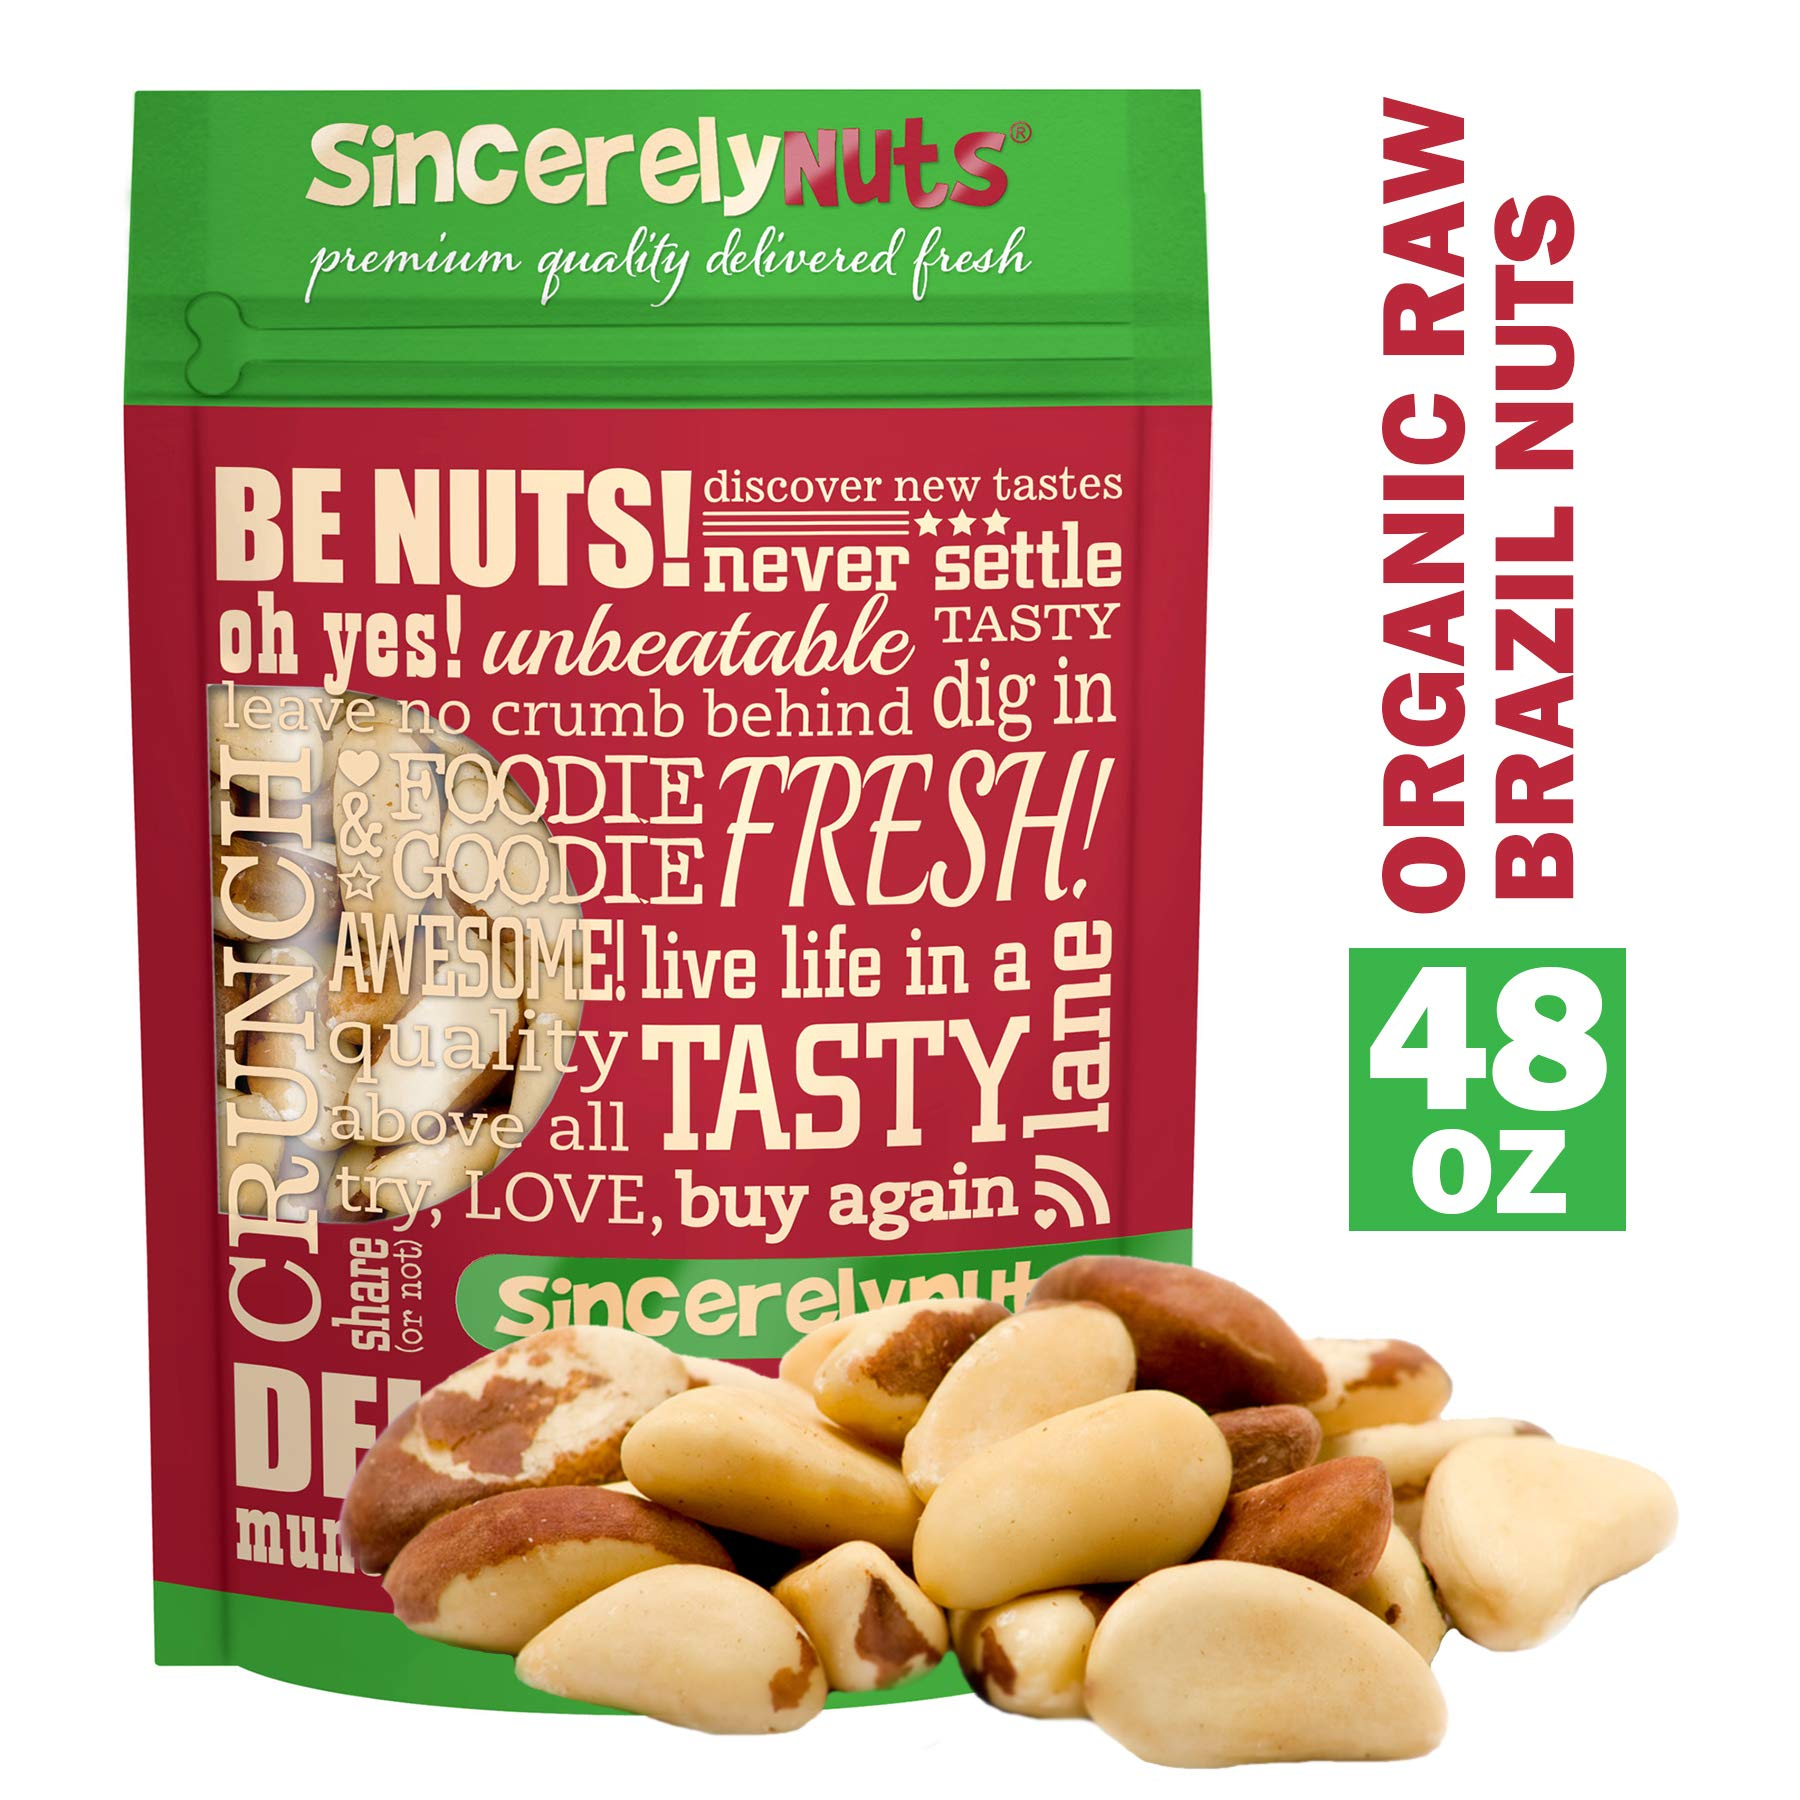 Sincerely Nuts Organic Raw Brazil Nuts No Shell (3 Lb. Bag) -Premium Healthy Snack Food | Whole, Kosher, Vegan, Gluten Free | Keto & Paleo Diet Friendly |Gourmet Snack | Vitamins & Minerals